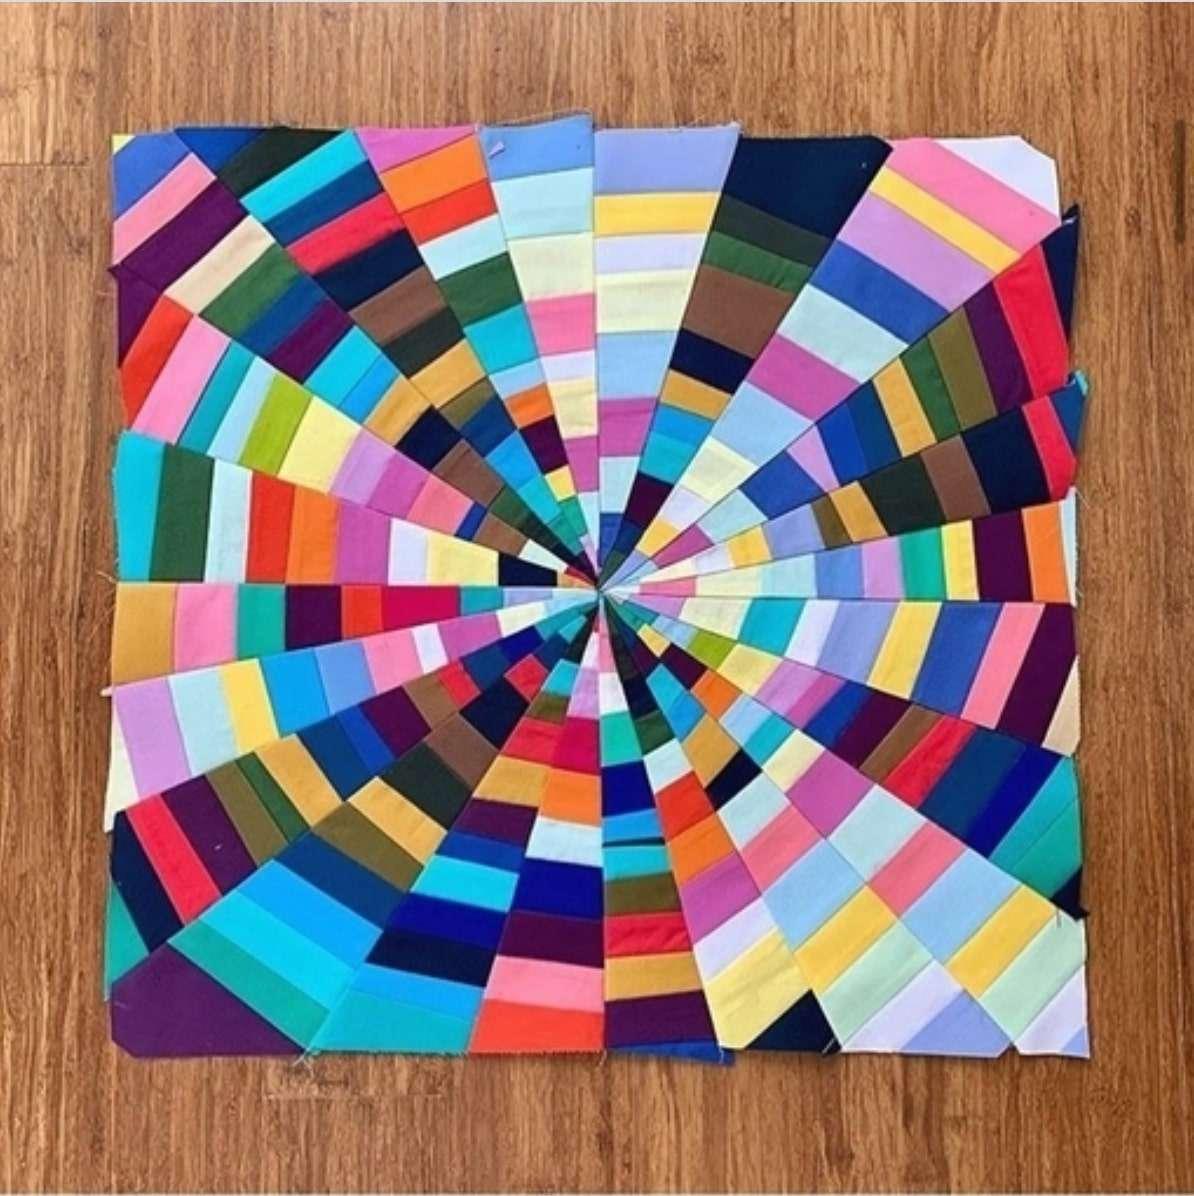 Art quilt, oeuvre d'art en tissu, multicolore, chutes de tissus